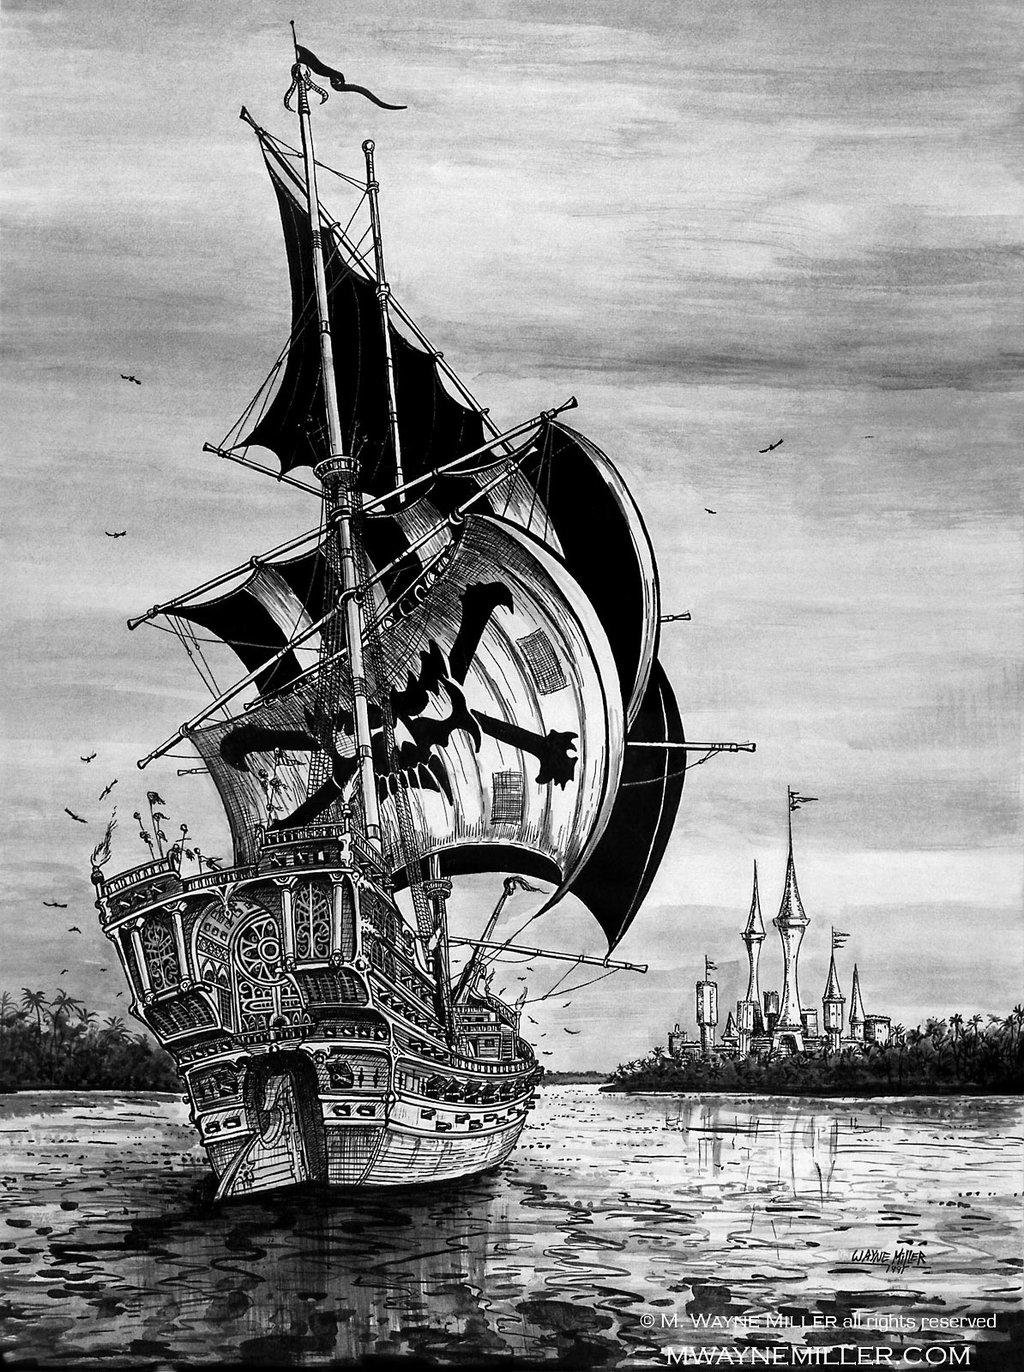 Drawn ship pirate shipwreck Ship Ship @deviantART deviantart com